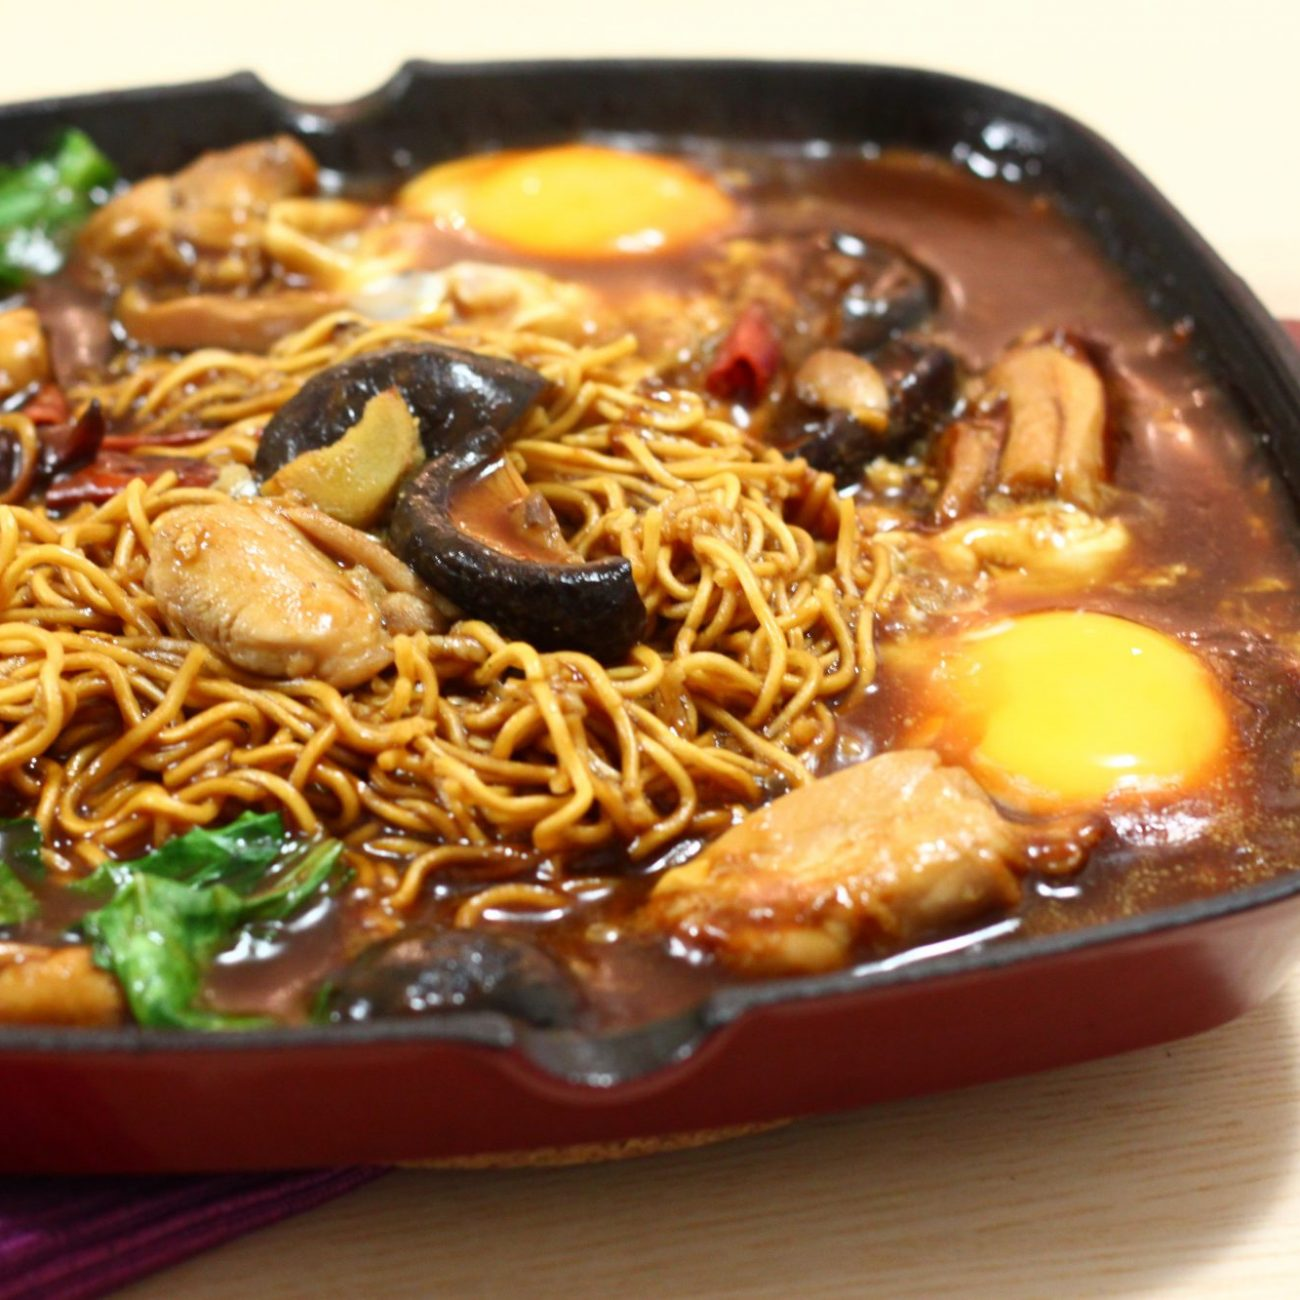 Hot Plate Noodle 铁板面